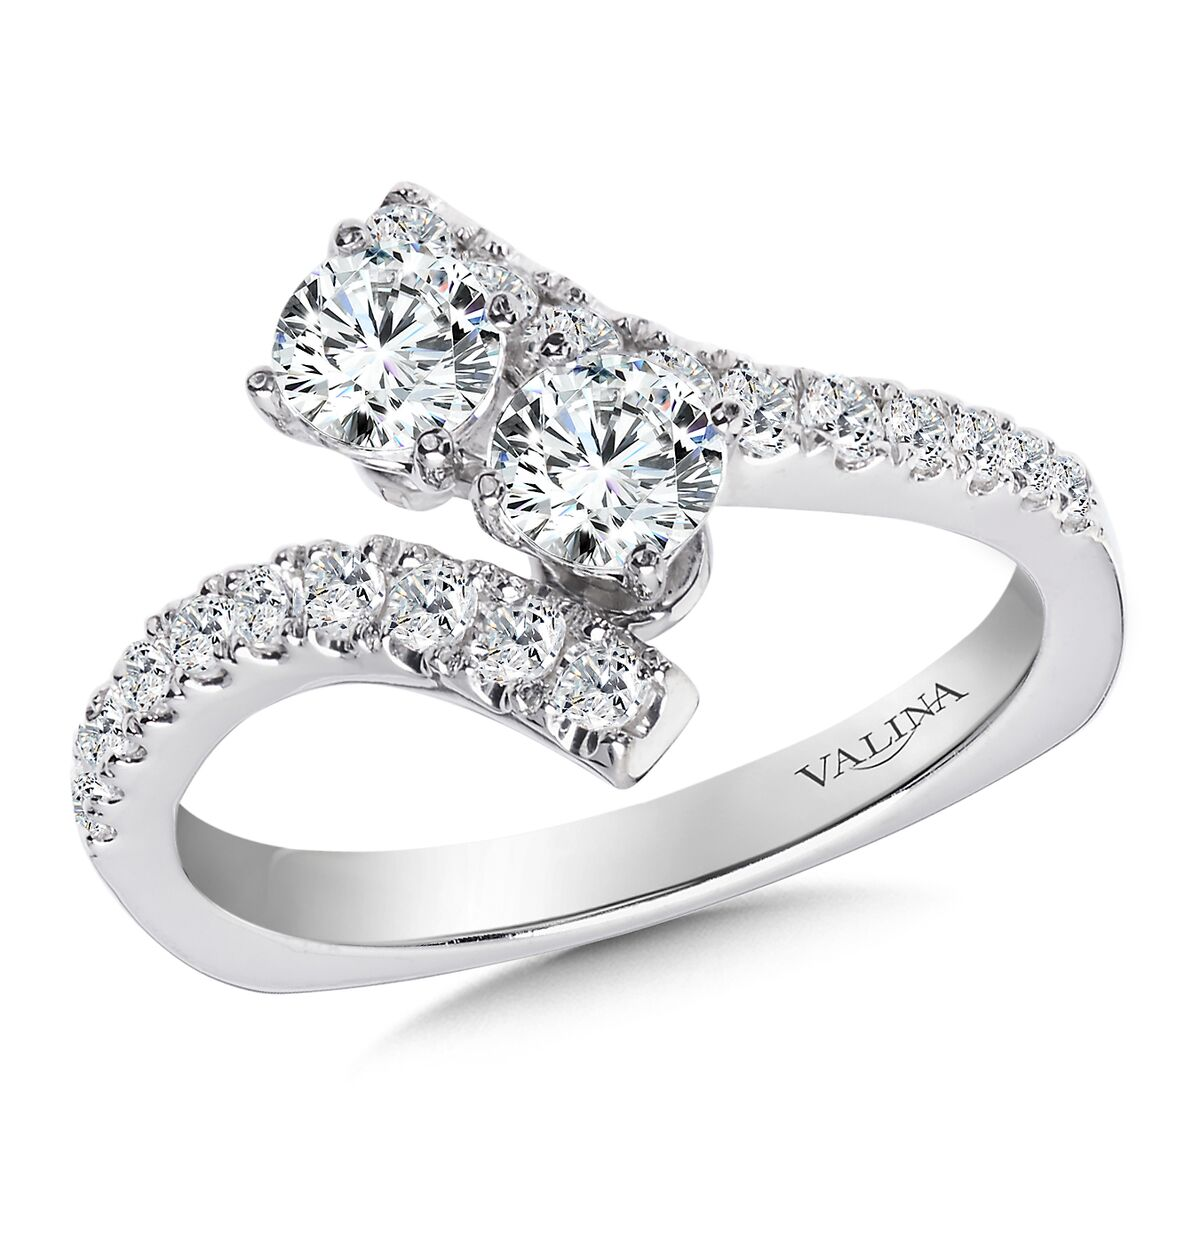 Custom_2_Stone_Diamond_Engagement_Ring_in_Dallas_Texas_-_Wholesale_Diamonds_-_Loose_Diamonds_4